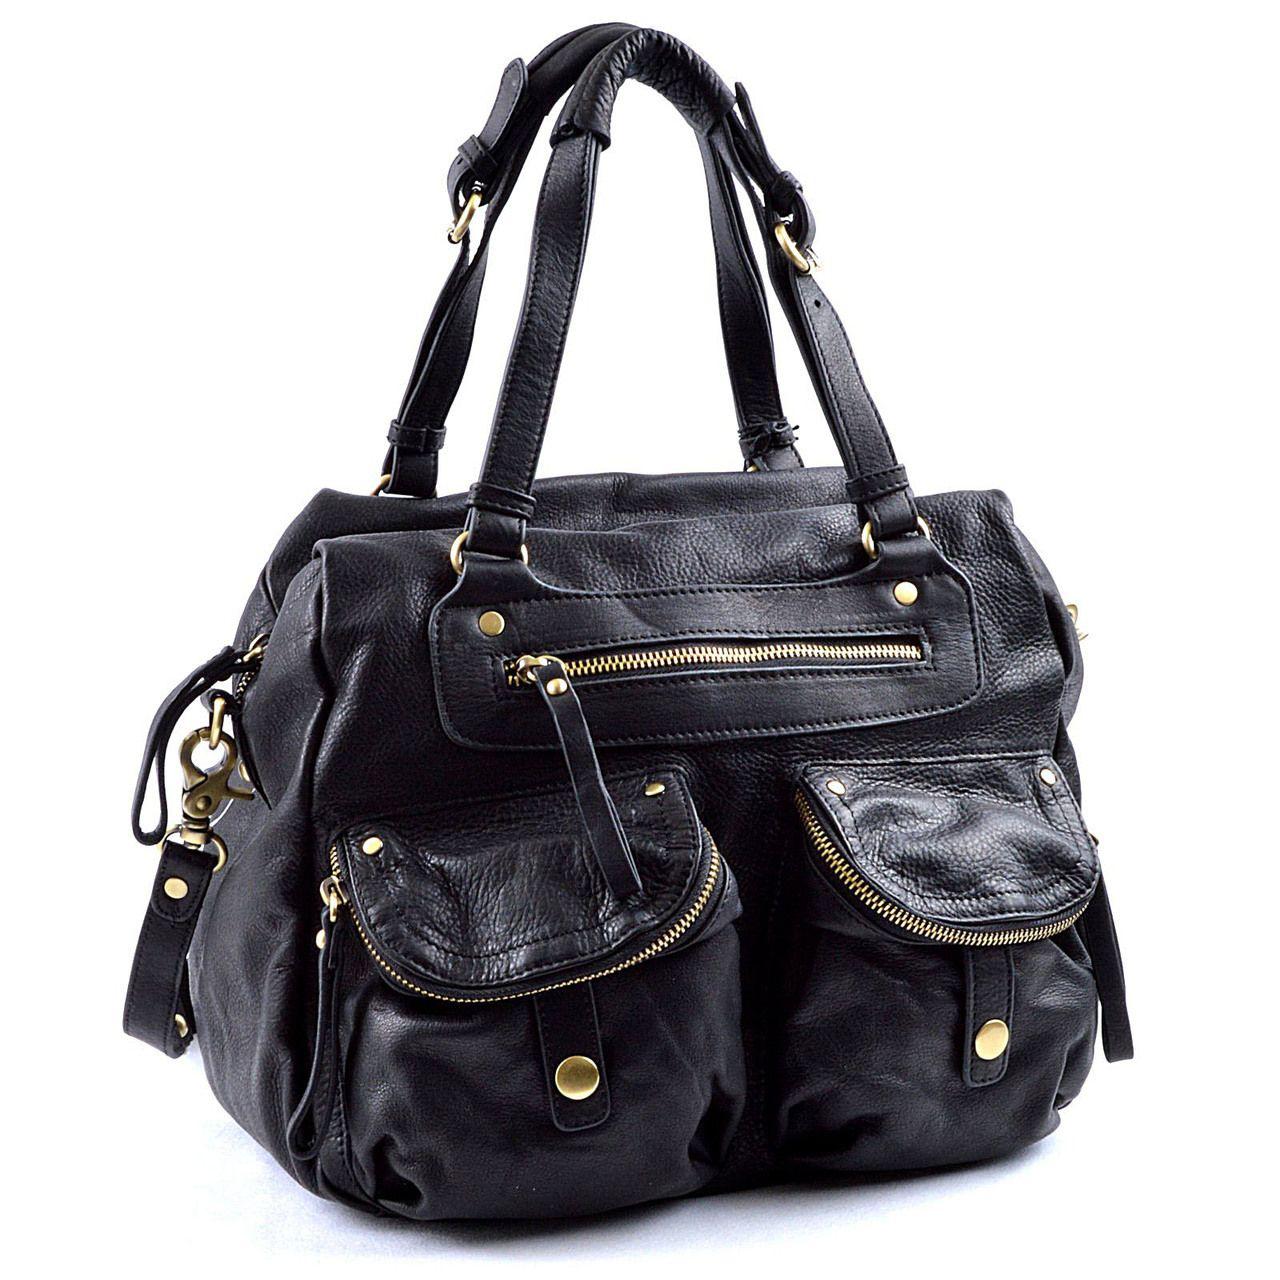 Authentic Designer Handbags Sabina New York Convertible Pocket Satchel In Genuine Top Grain Leather